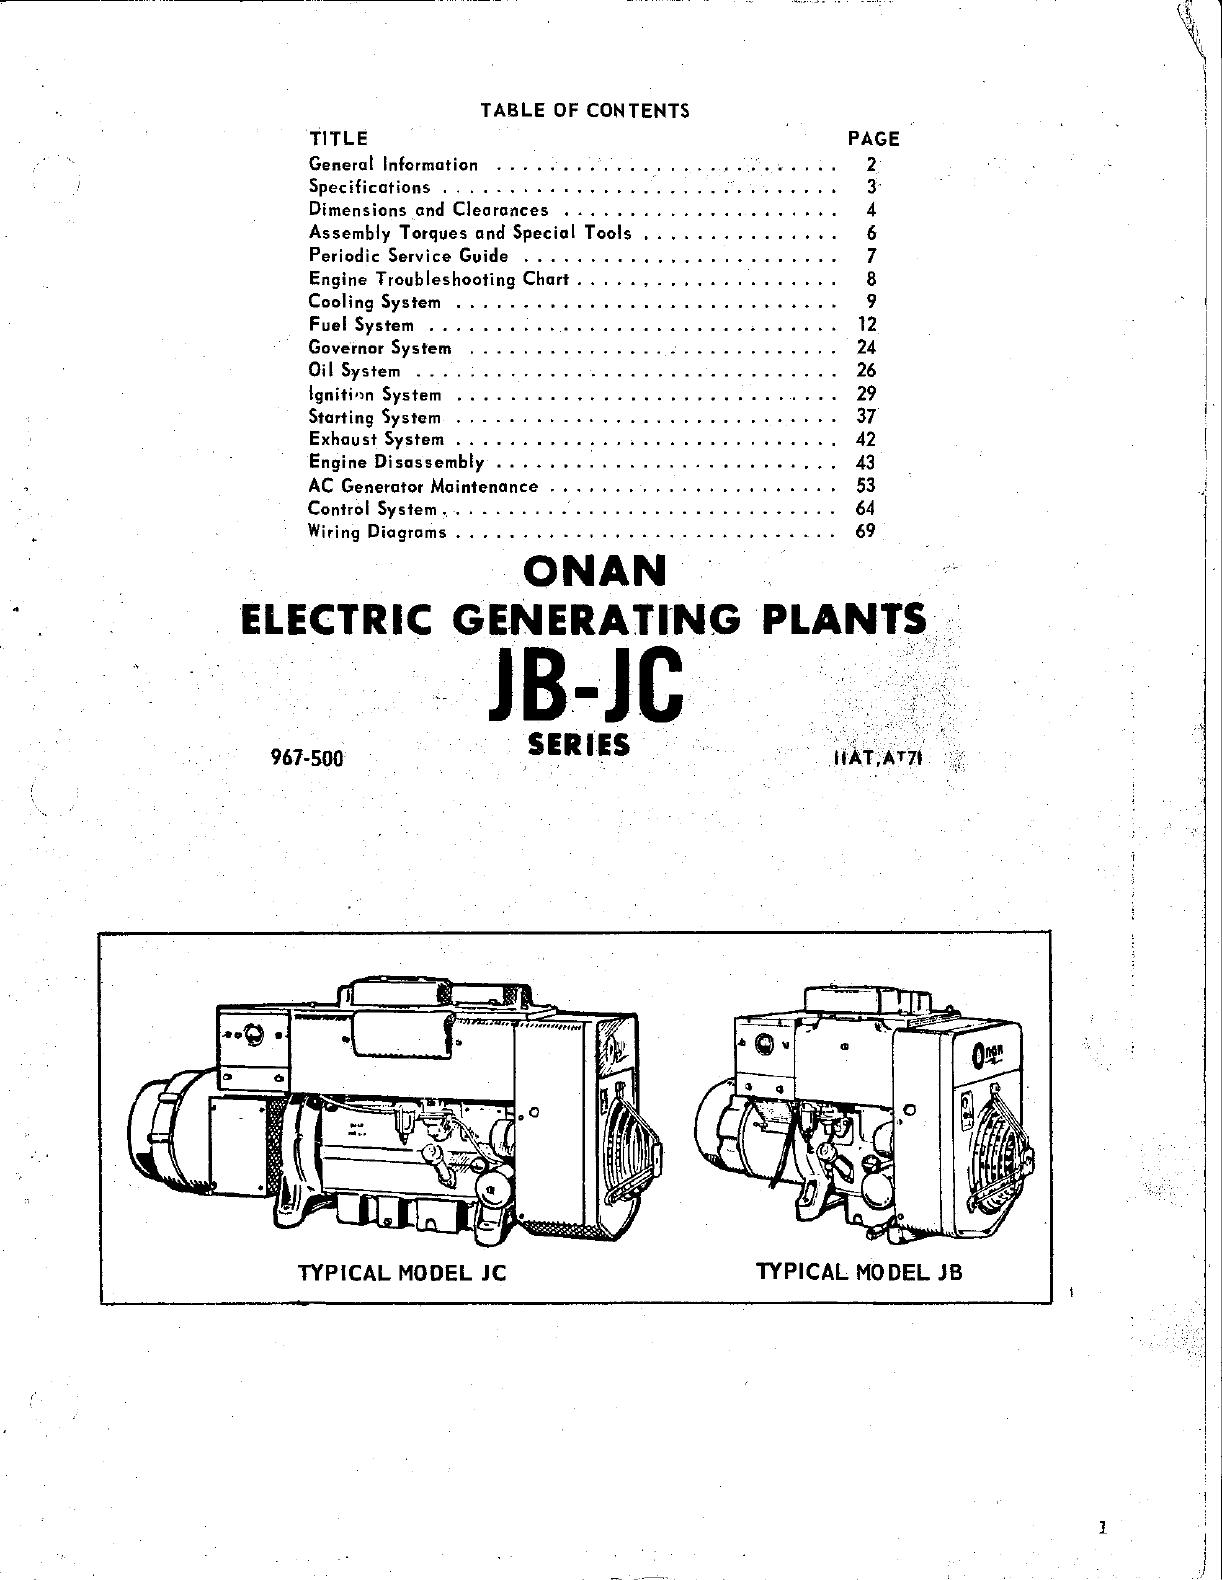 Jb Onan Wiring Complete Diagrams J B Diagram 967 0500 Jc Spec A T Genset Service Manual Magneciter End Rh Usermanual Wiki Generator 300 3056 Board Engine